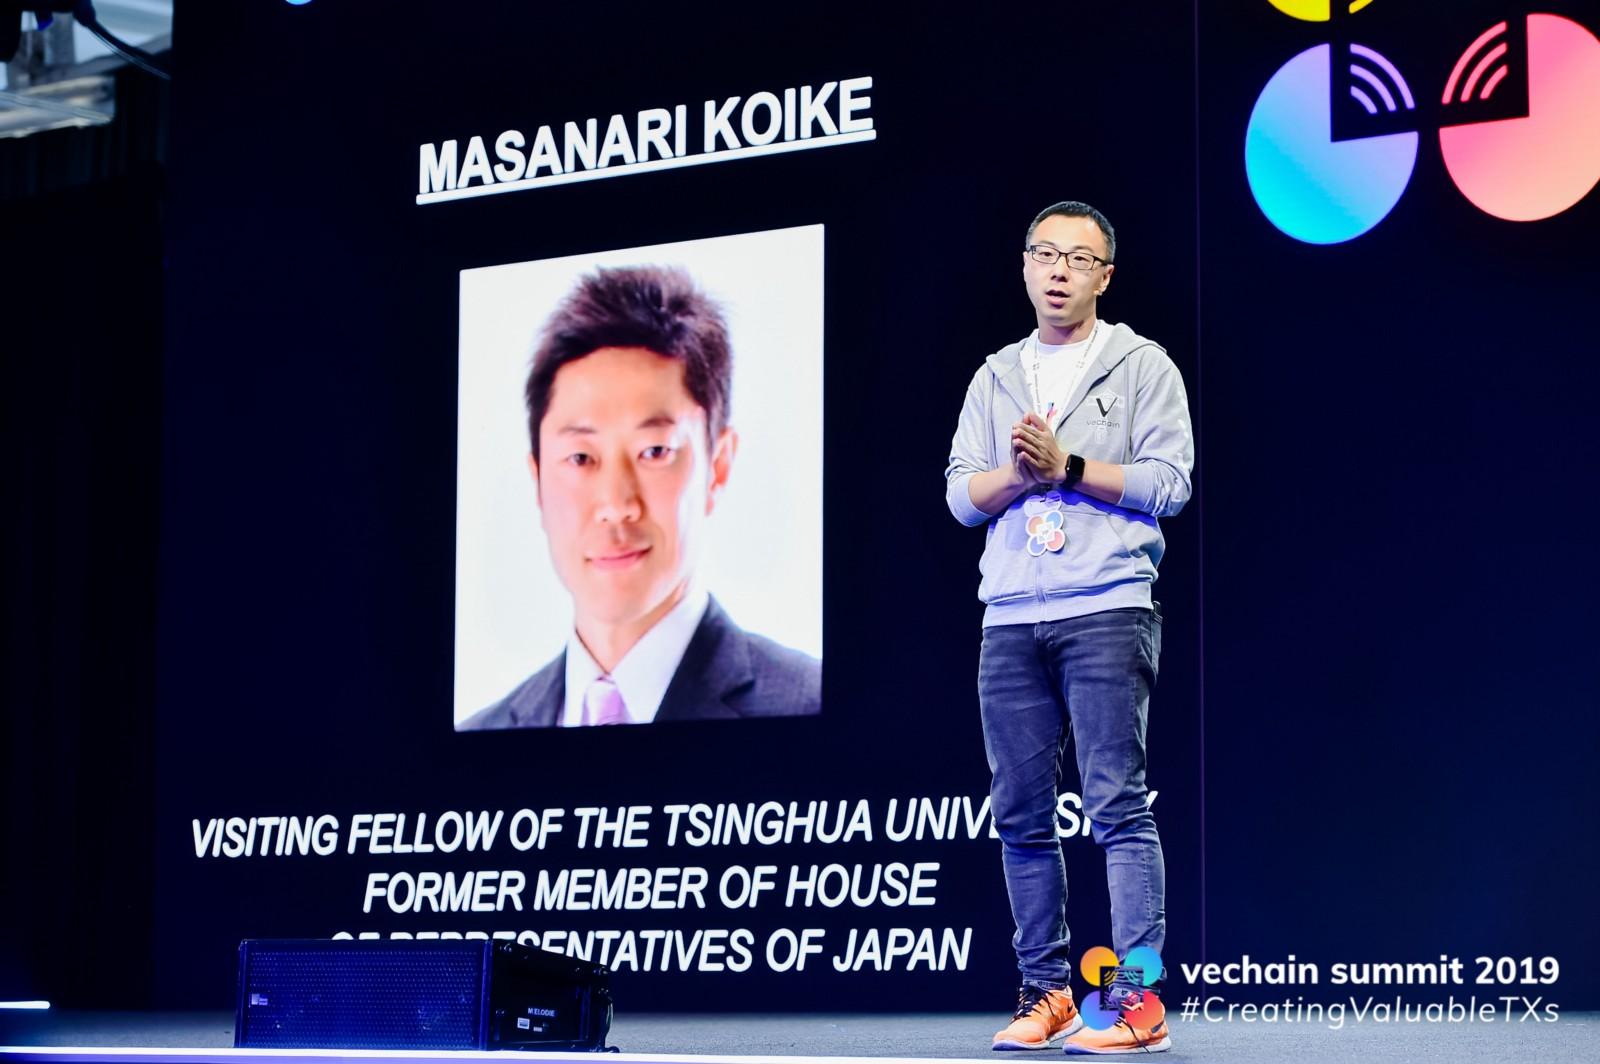 Sunny Lu announced Masanari Koike as the new advisory board member